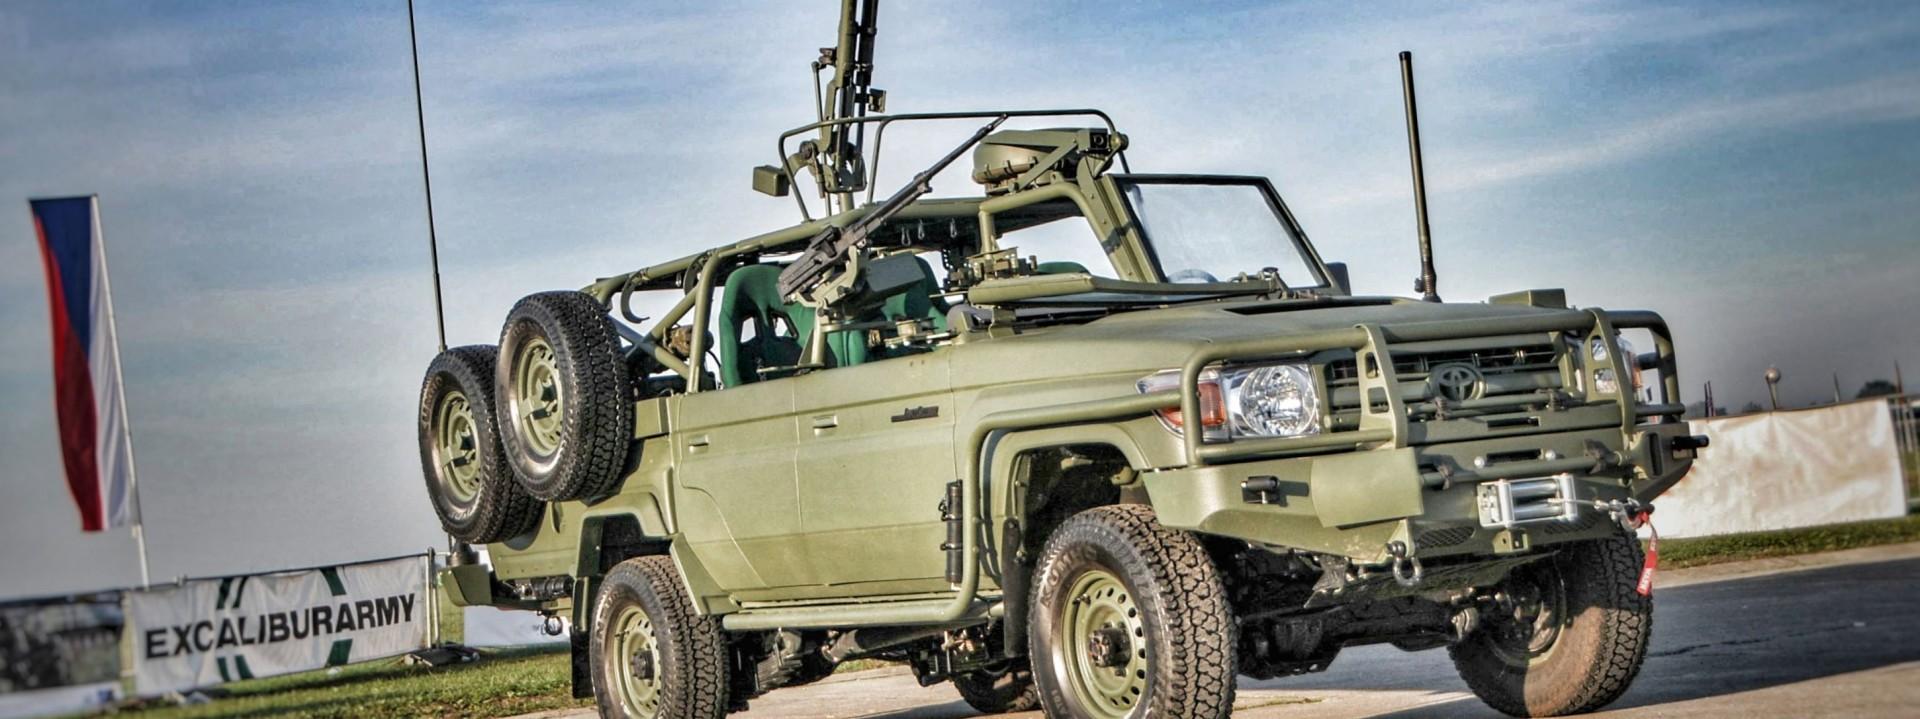 Resultado de imagen para Gepard, a new 4x4 vehicle based on the Toyota Land Cruiser Model 70